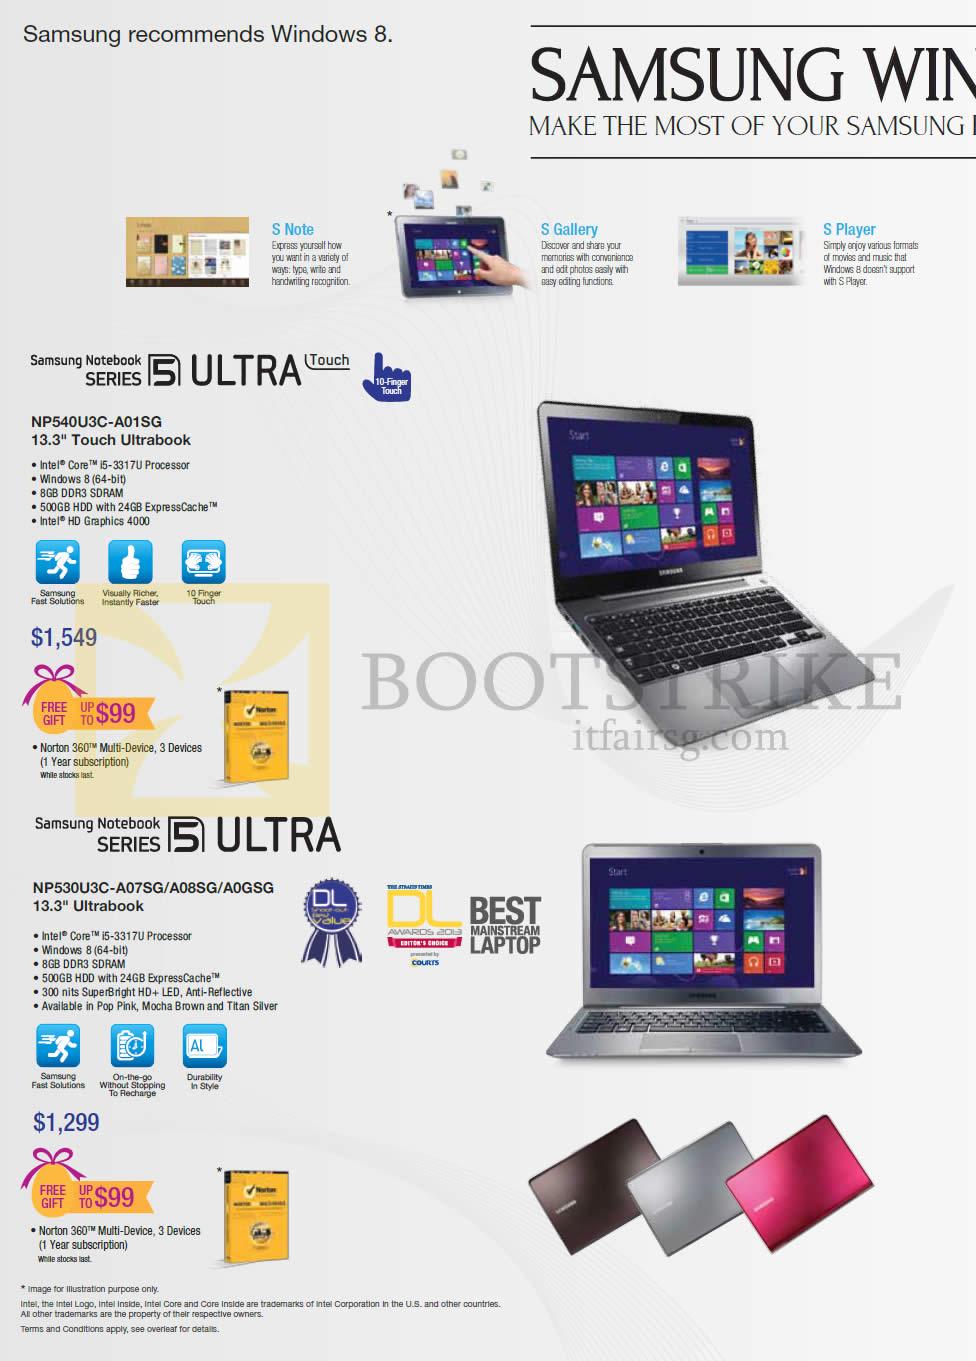 IT SHOW 2013 price list image brochure of Samsung Notebooks Series 5 NP540U3C-A01SG Ultrabook, NP530U3C-A07SG A08SG A0GSG